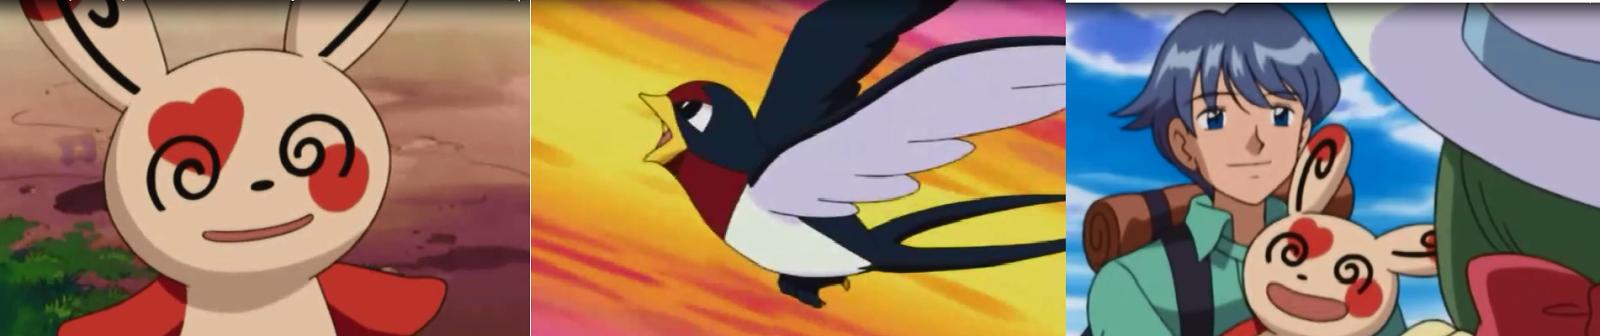 Pokemon Capitulo 17 Temporada 7 En Busca De Un Spinda